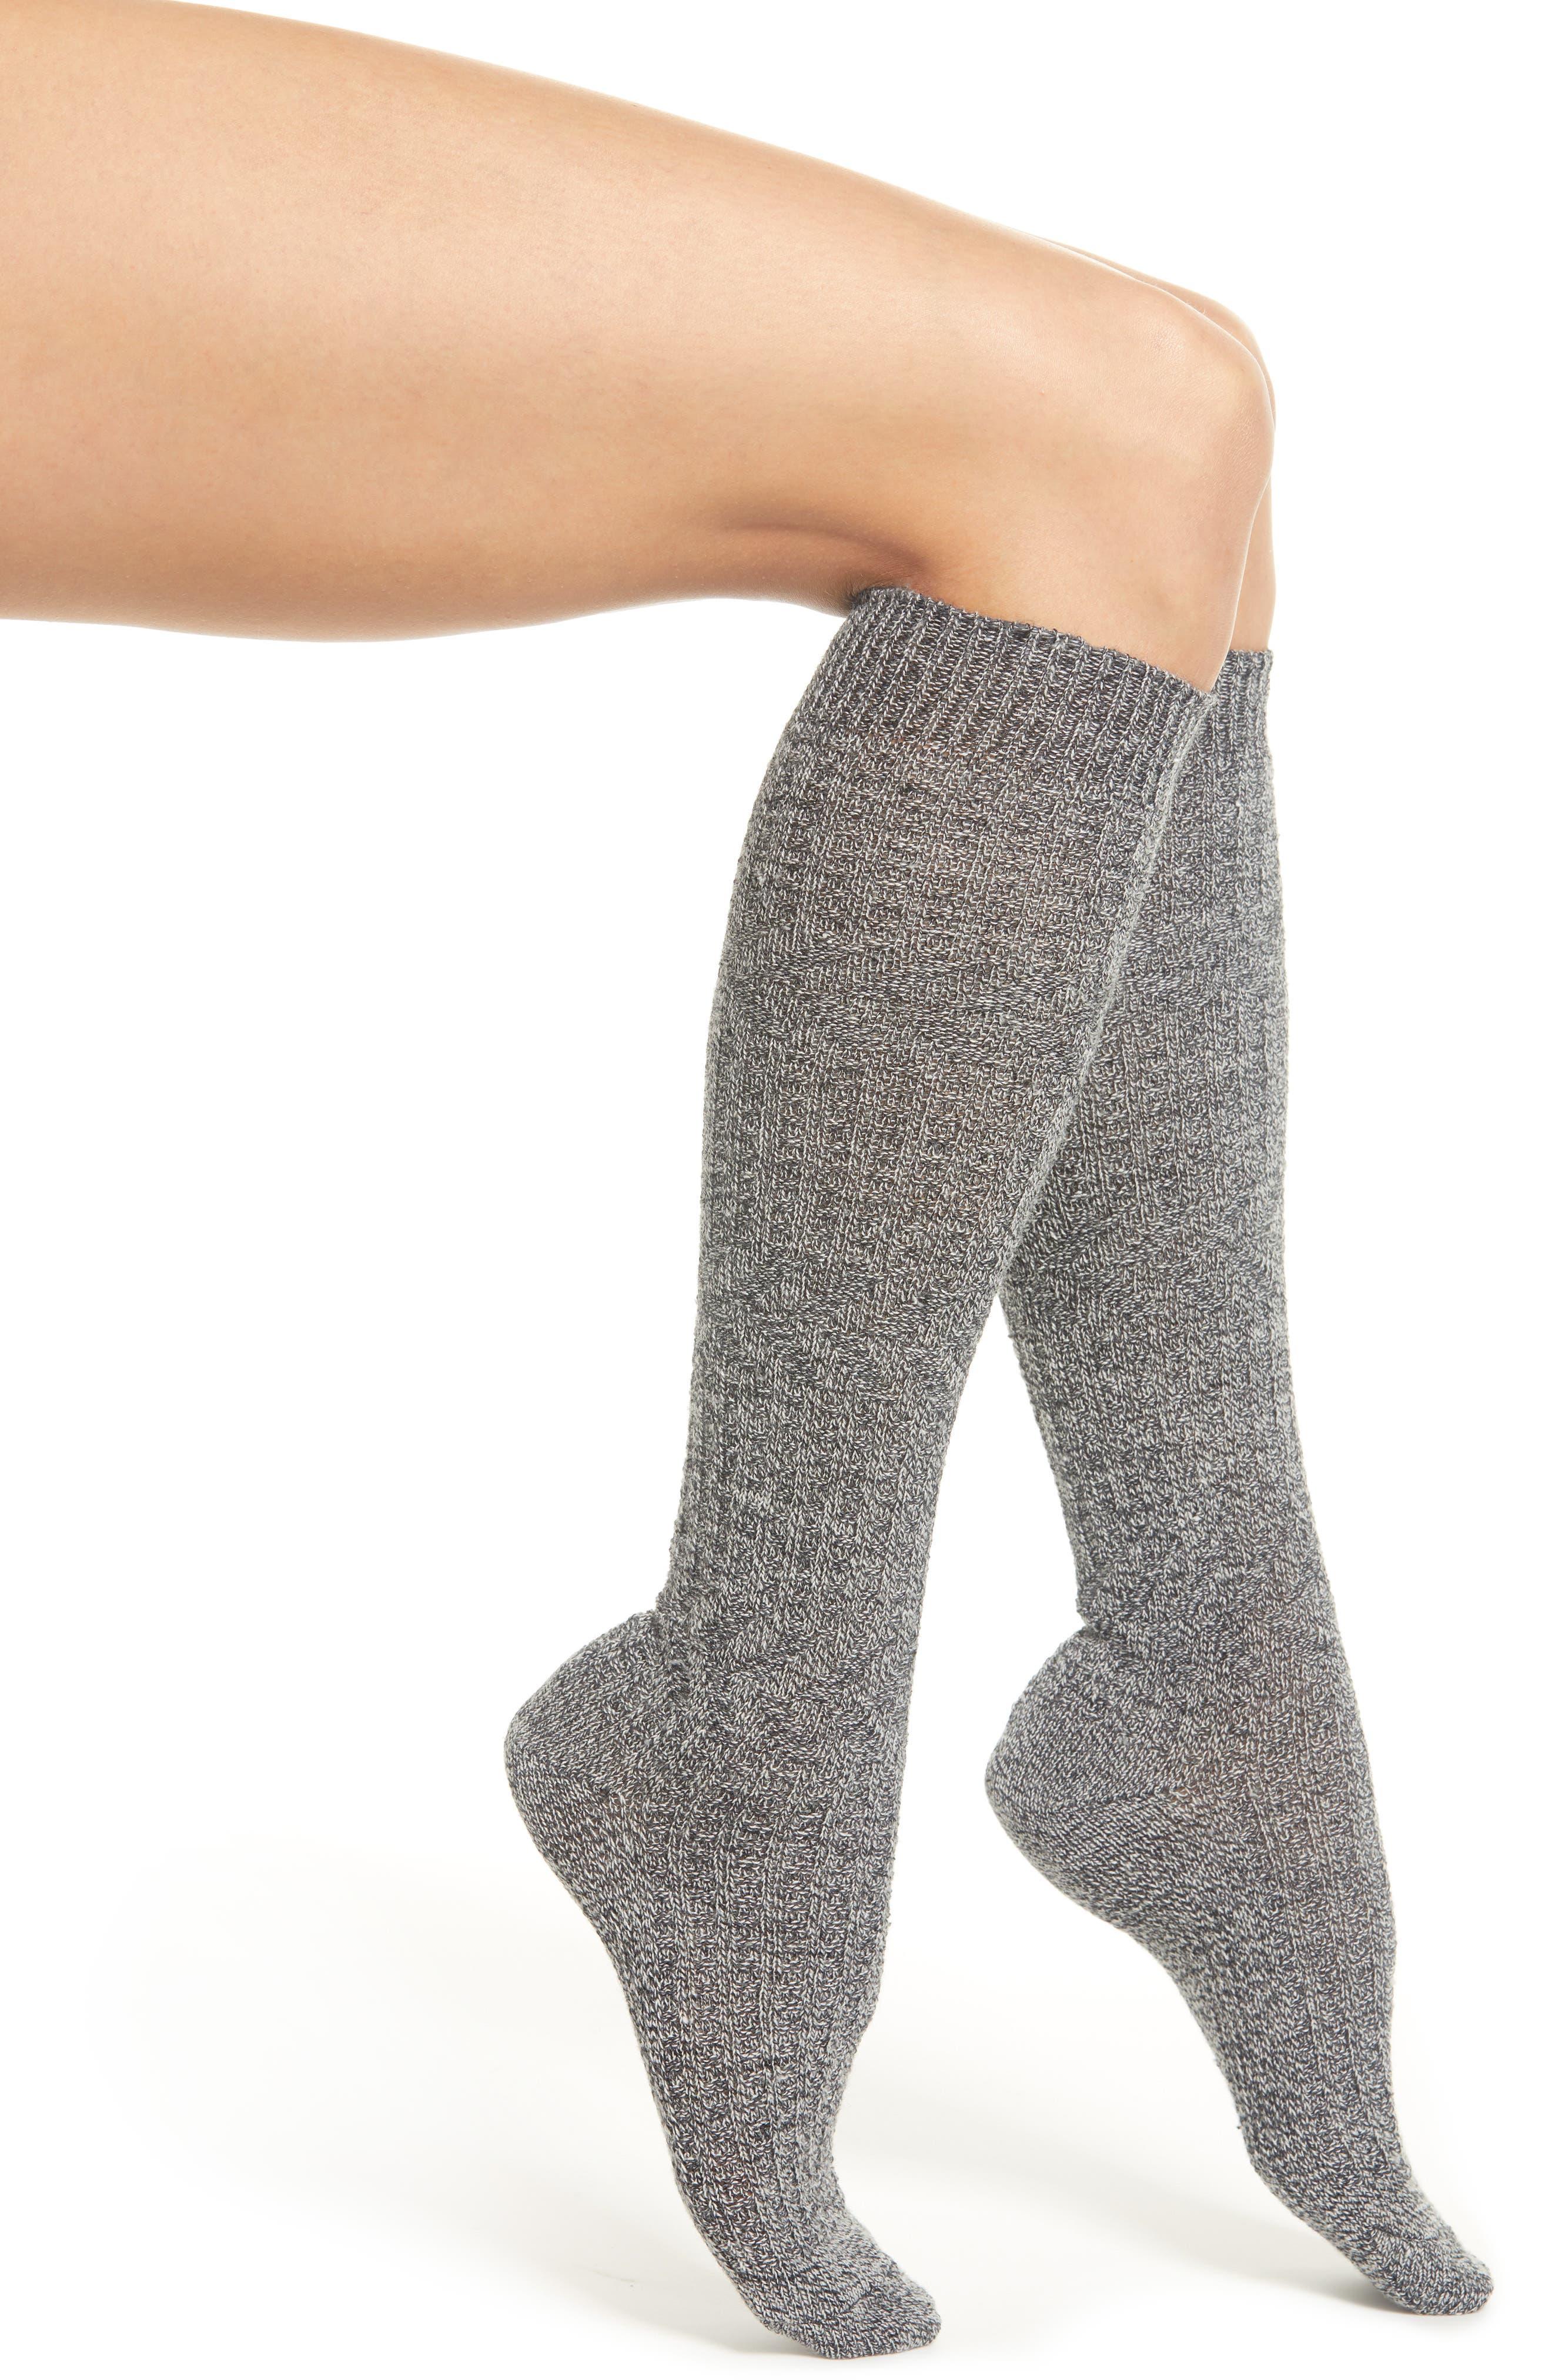 Wheat Fields Knee High Socks,                         Main,                         color, CHARCOAL HEATHER-WINTER WHITE